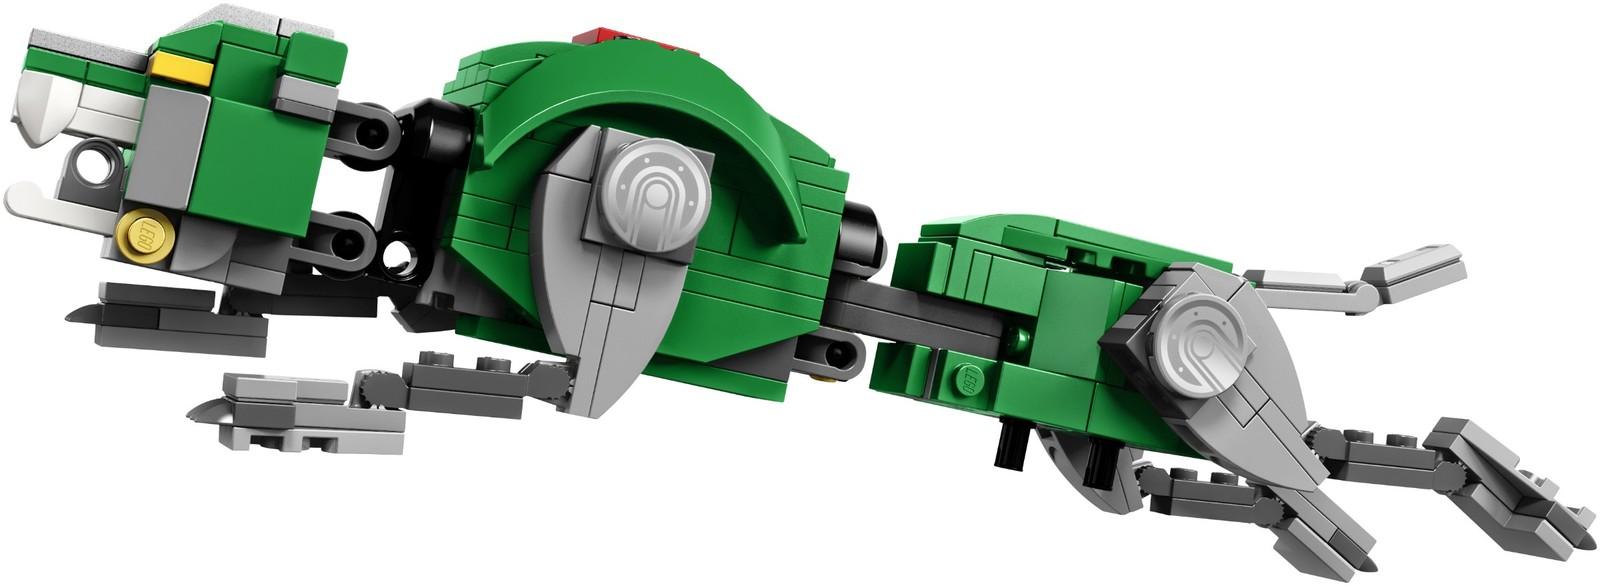 LEGO Idea - Voltron (21311) image